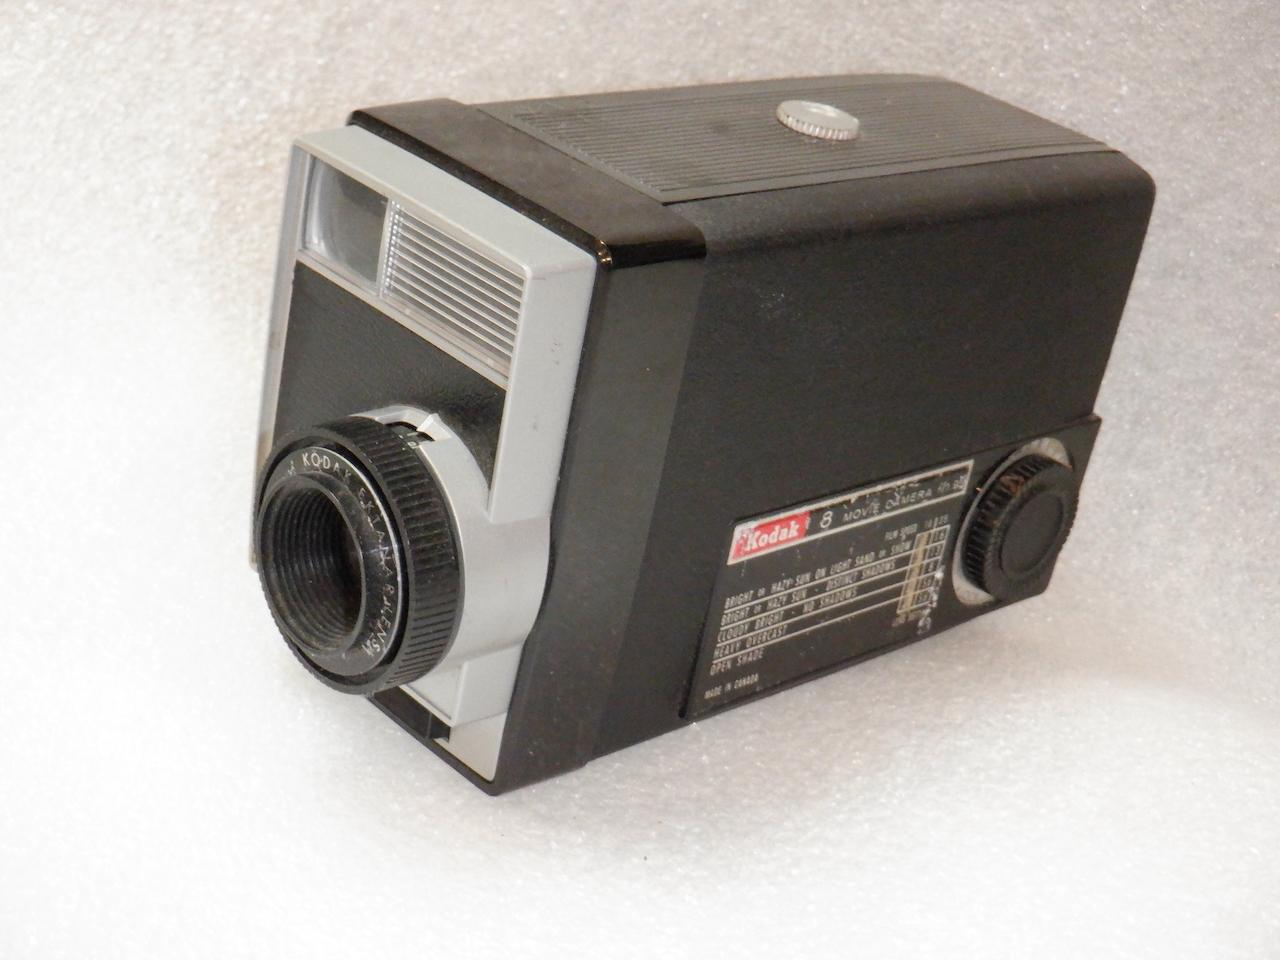 Kodak 8 Movie Camera